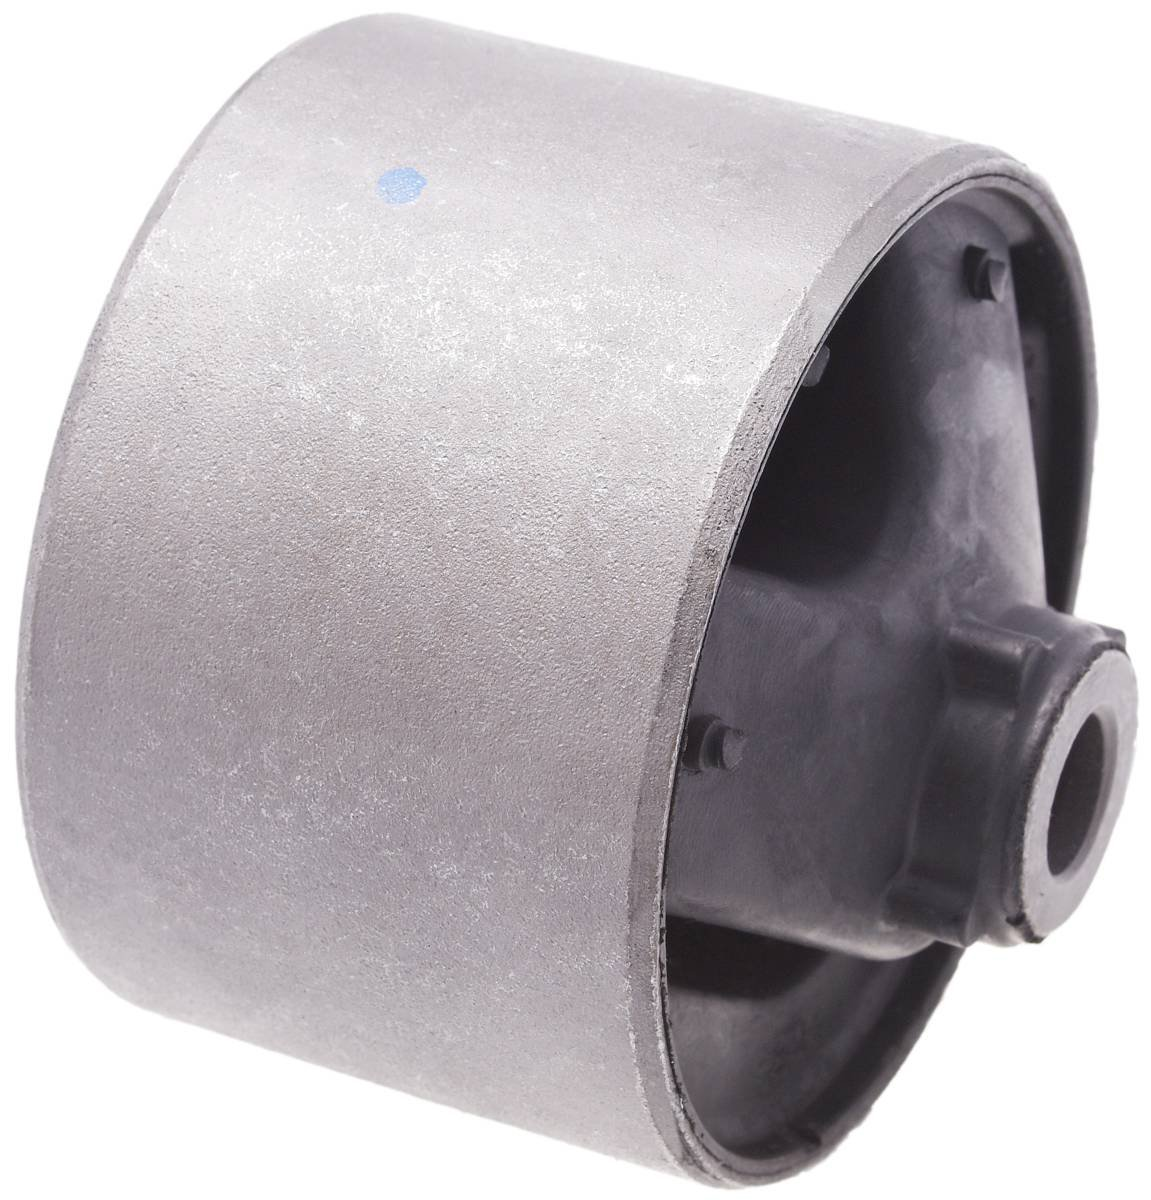 ARM BUSHING LEFT ENGINE MOUNT - Febest # MMB-035 - 1 Year Warranty